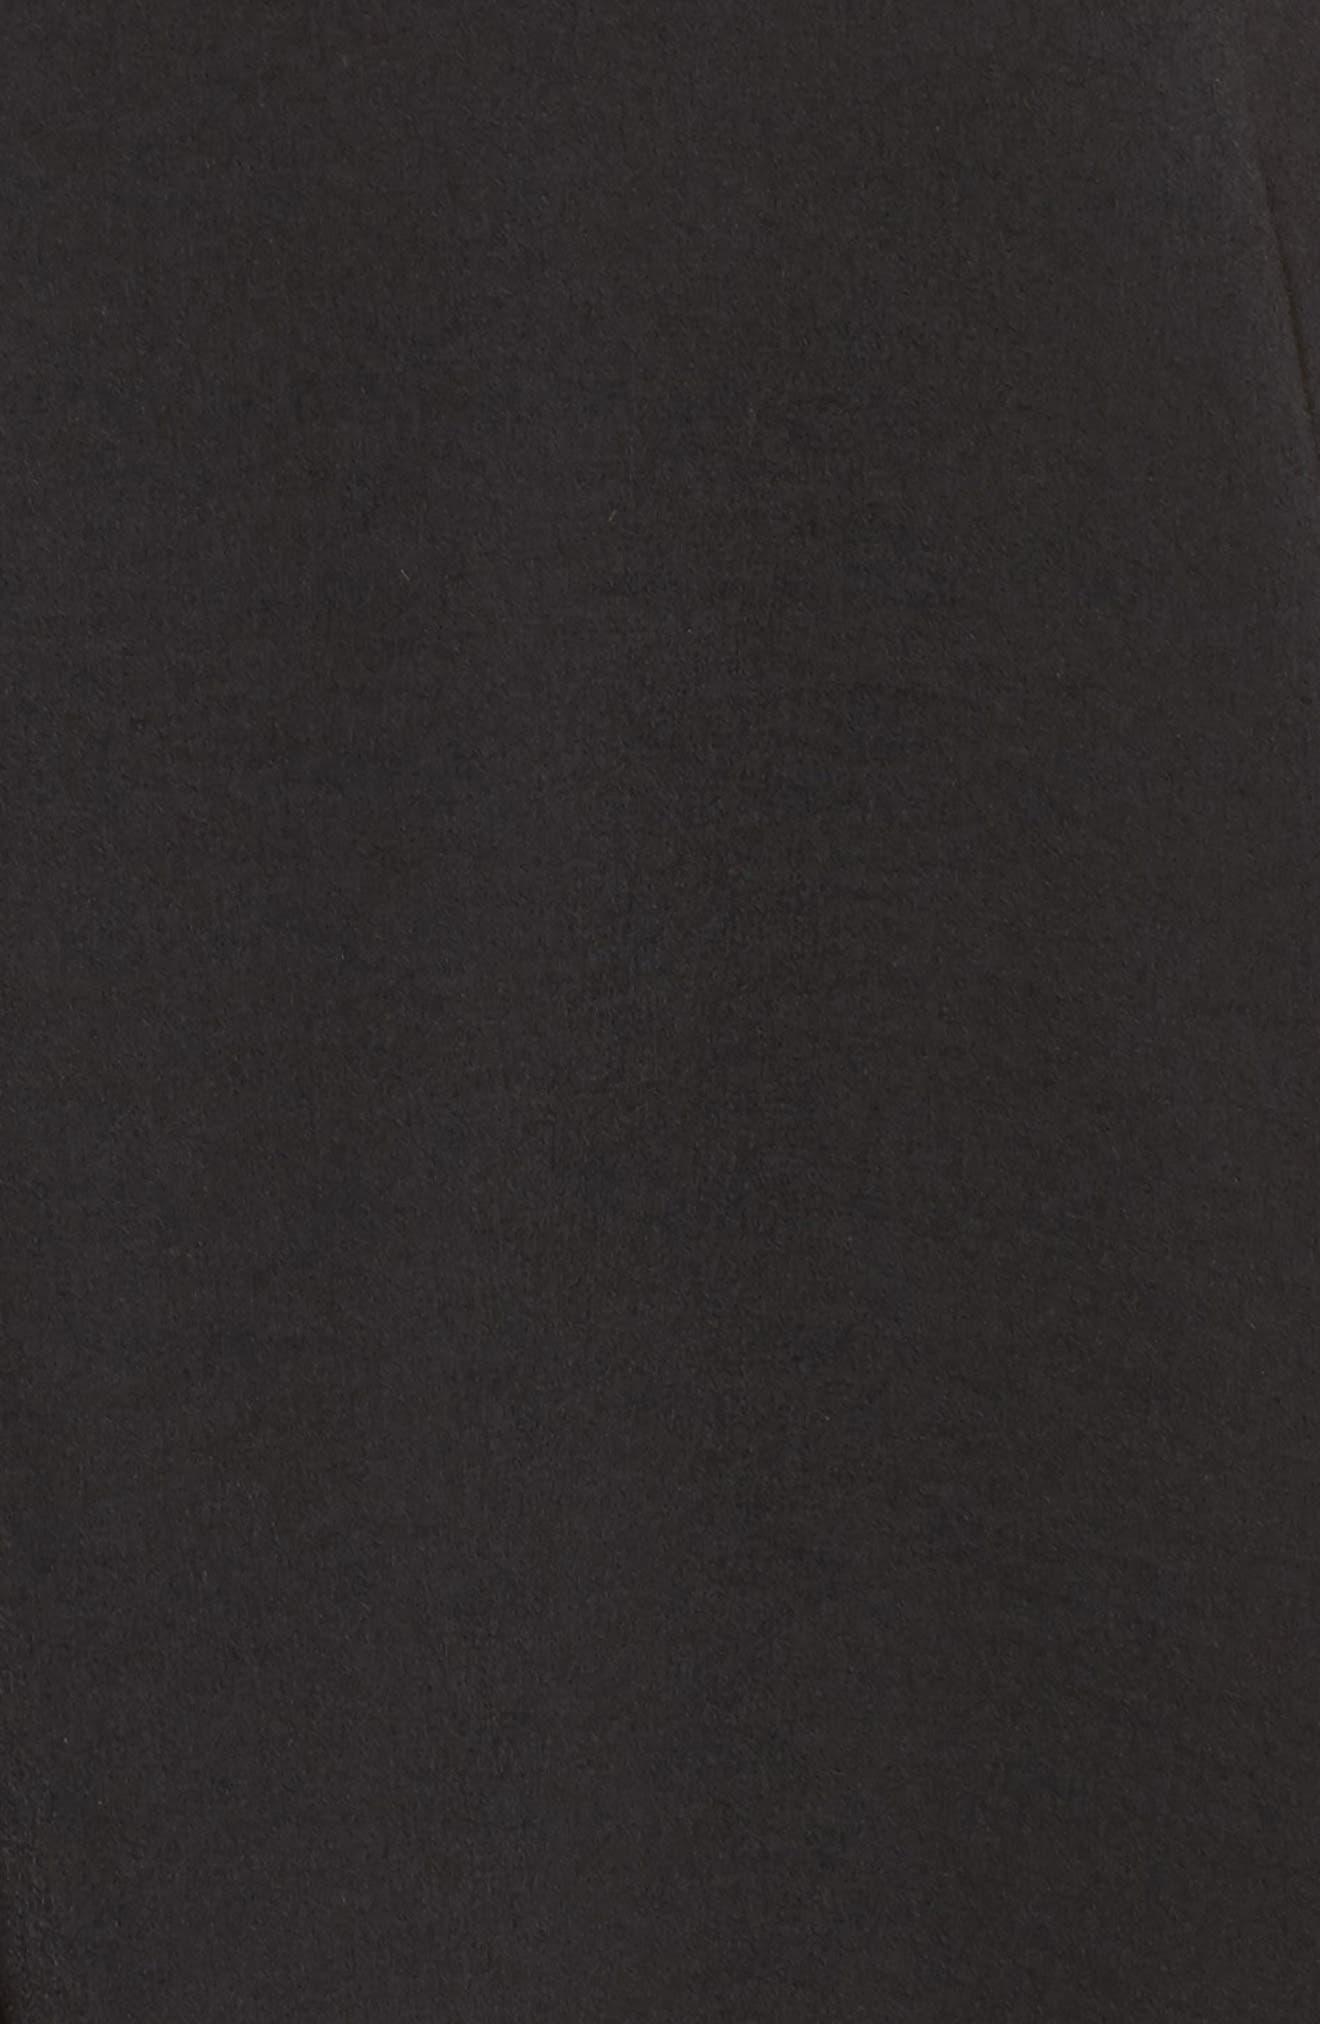 Washed Satin Short Pajamas & Eye Mask,                             Alternate thumbnail 5, color,                             001